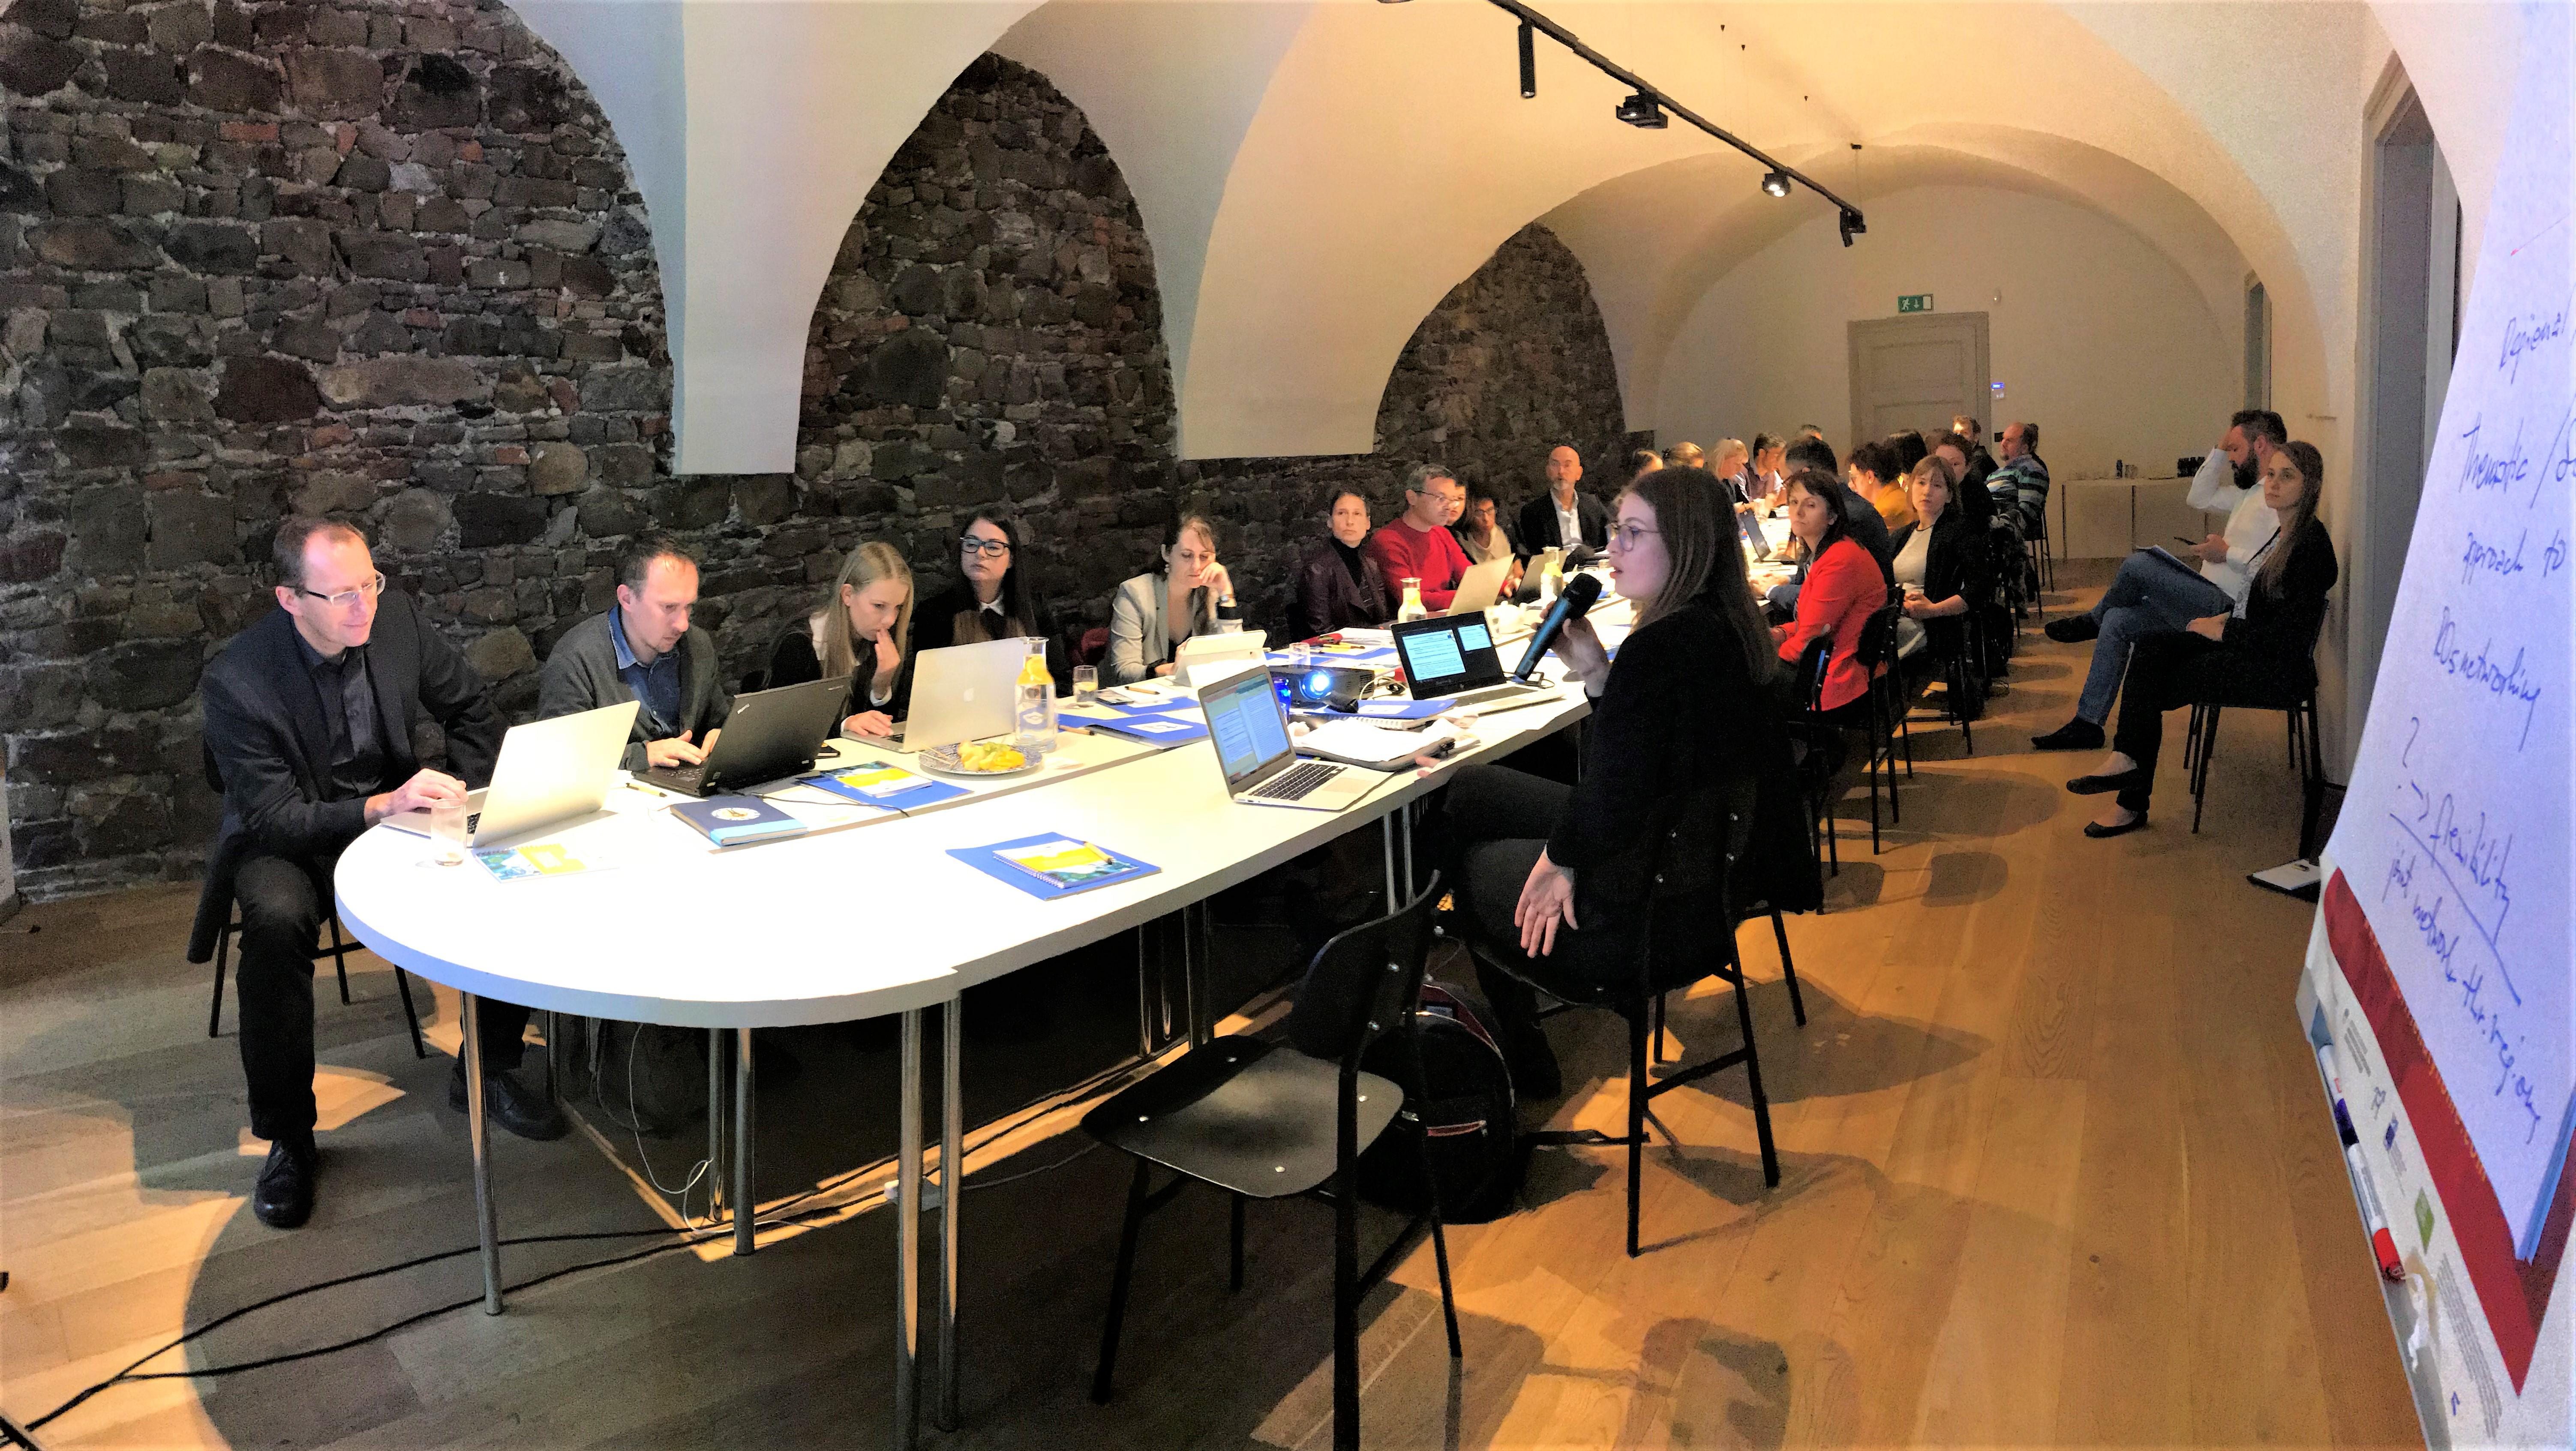 O pametni specializaciji so govorili v Mariboru